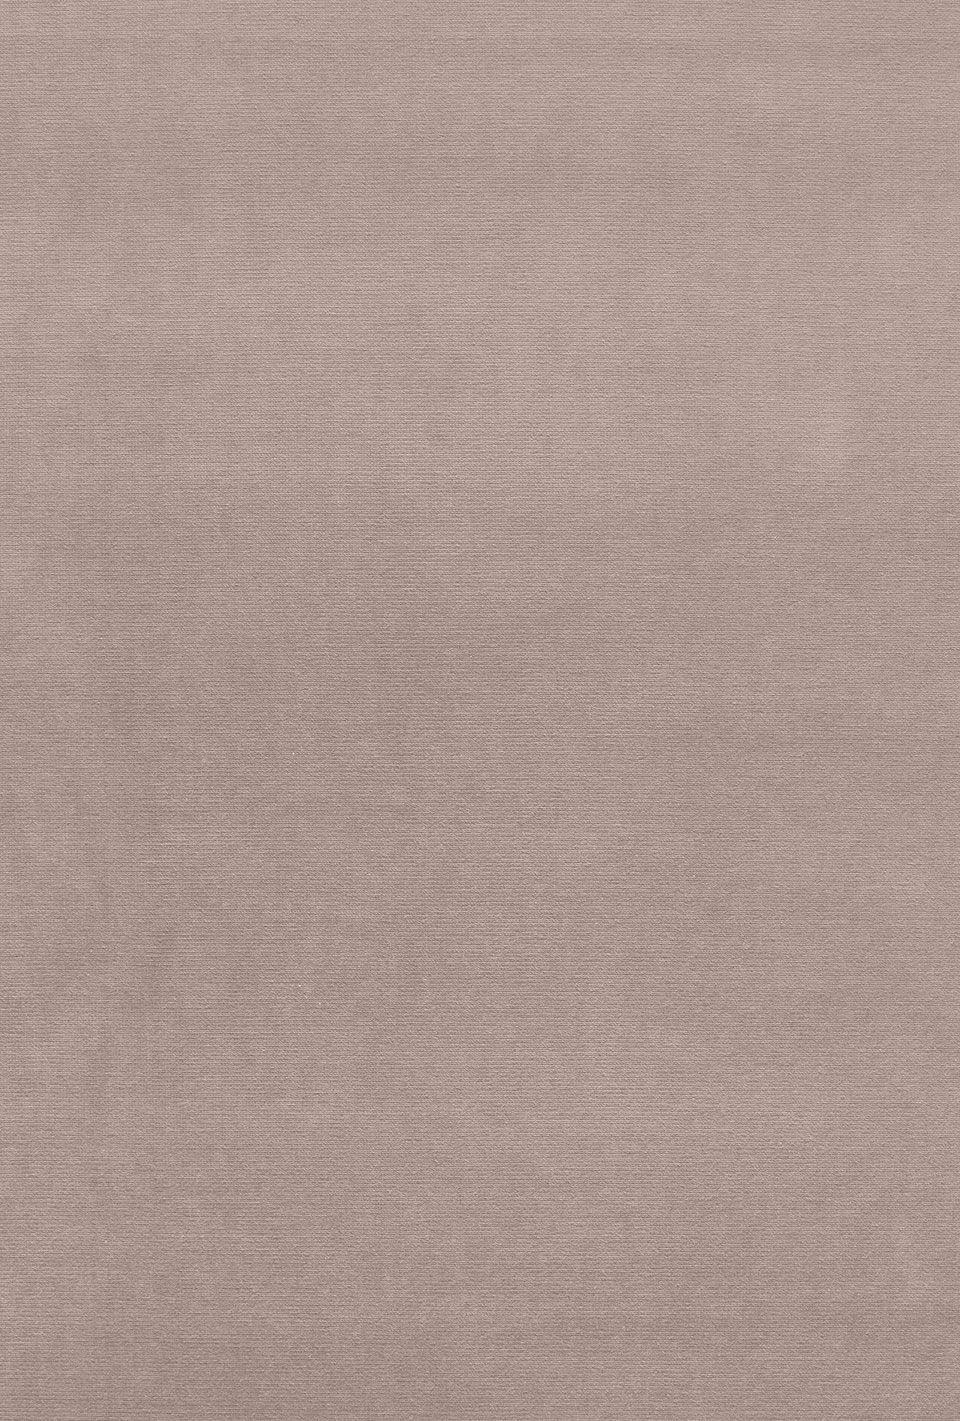 Fabric | Gainsborough Velvet in Stone | Schumacher